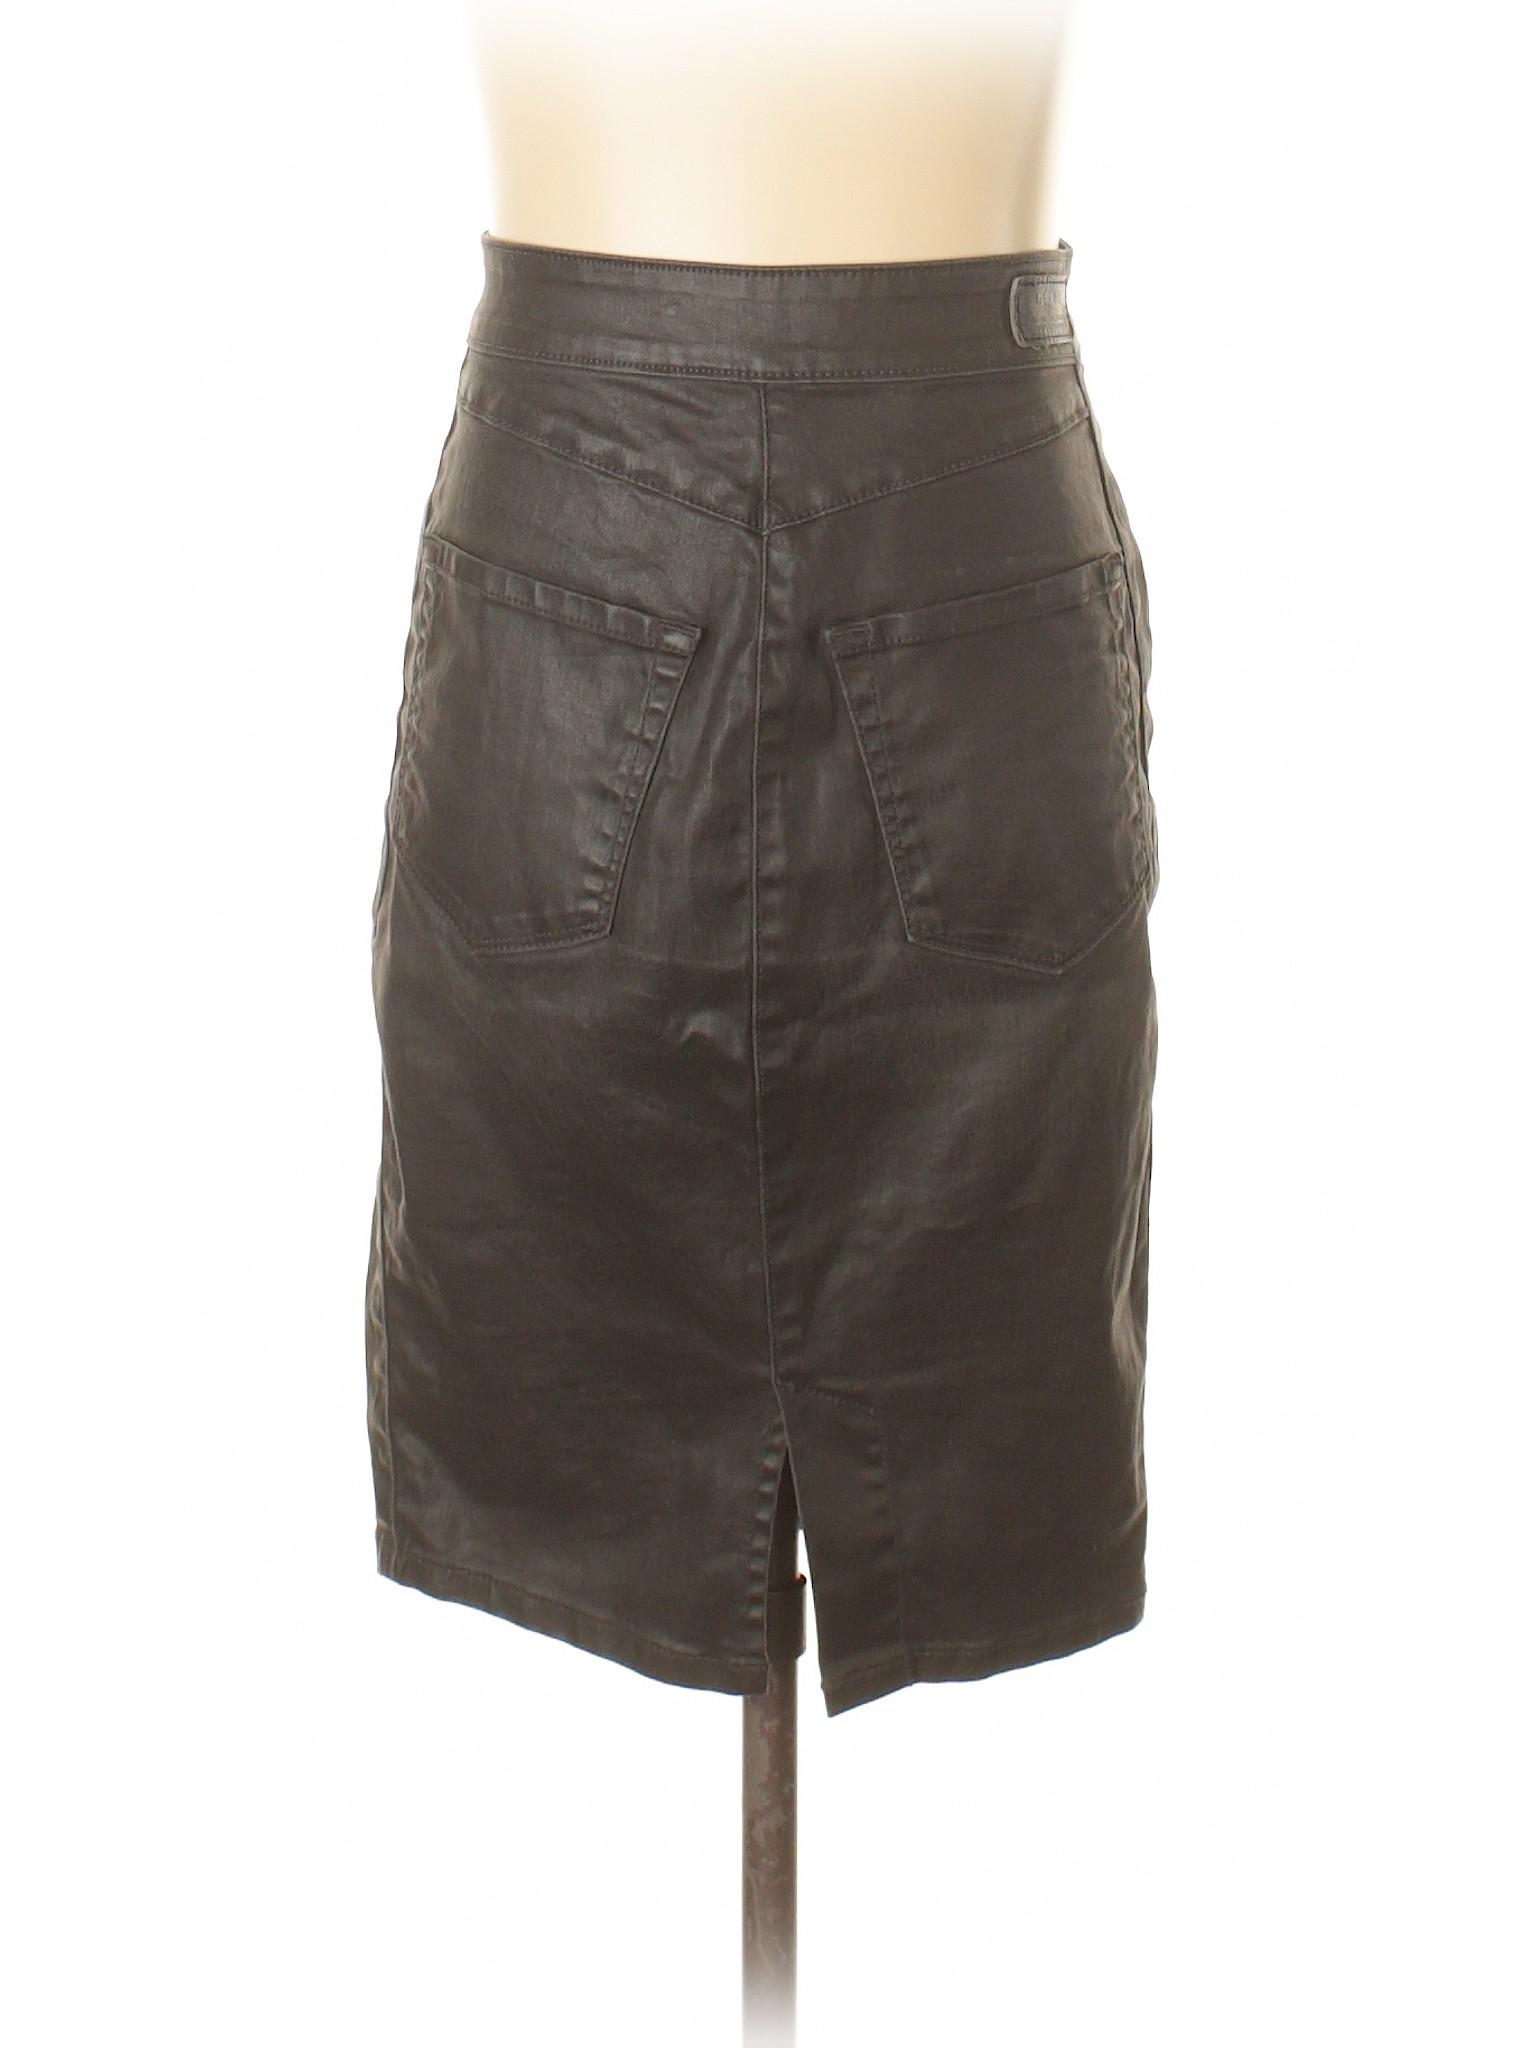 Boutique Skirt Skirt Boutique Casual Skirt Casual Casual Skirt Skirt Boutique Casual Boutique Boutique Casual Boutique Casual qxYwXFzPwA